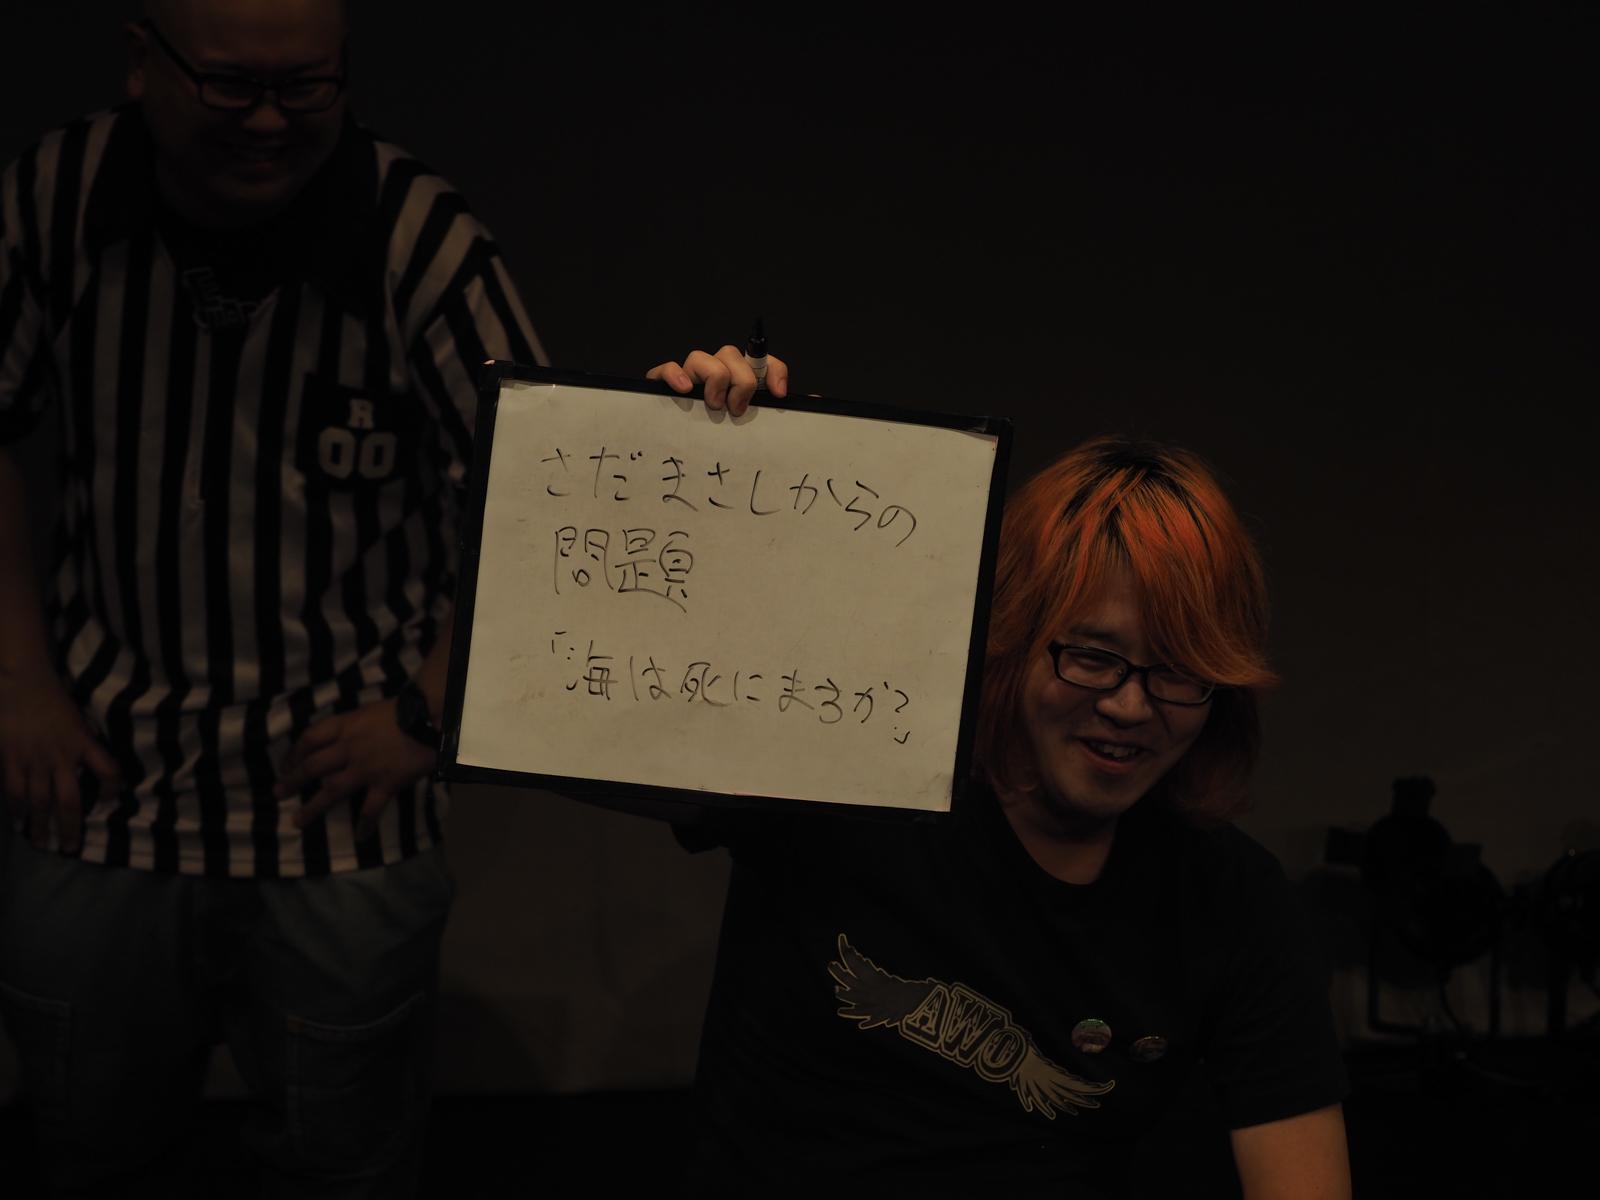 f:id:motomachi24:20170226193852j:plain